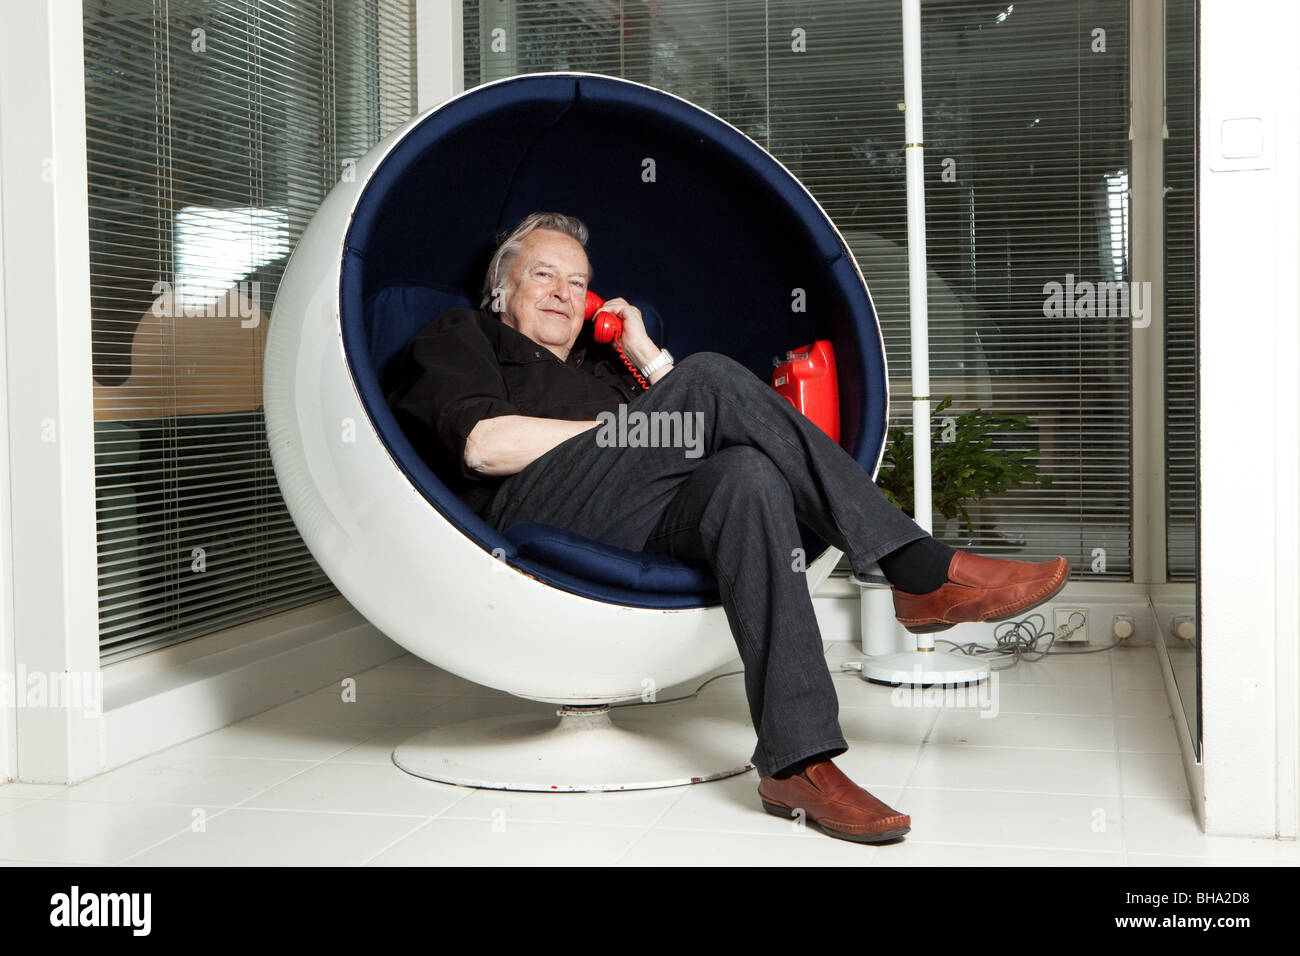 Eero Aarnio, designer of ball chair Stock Photo: 27880980 - Alamy